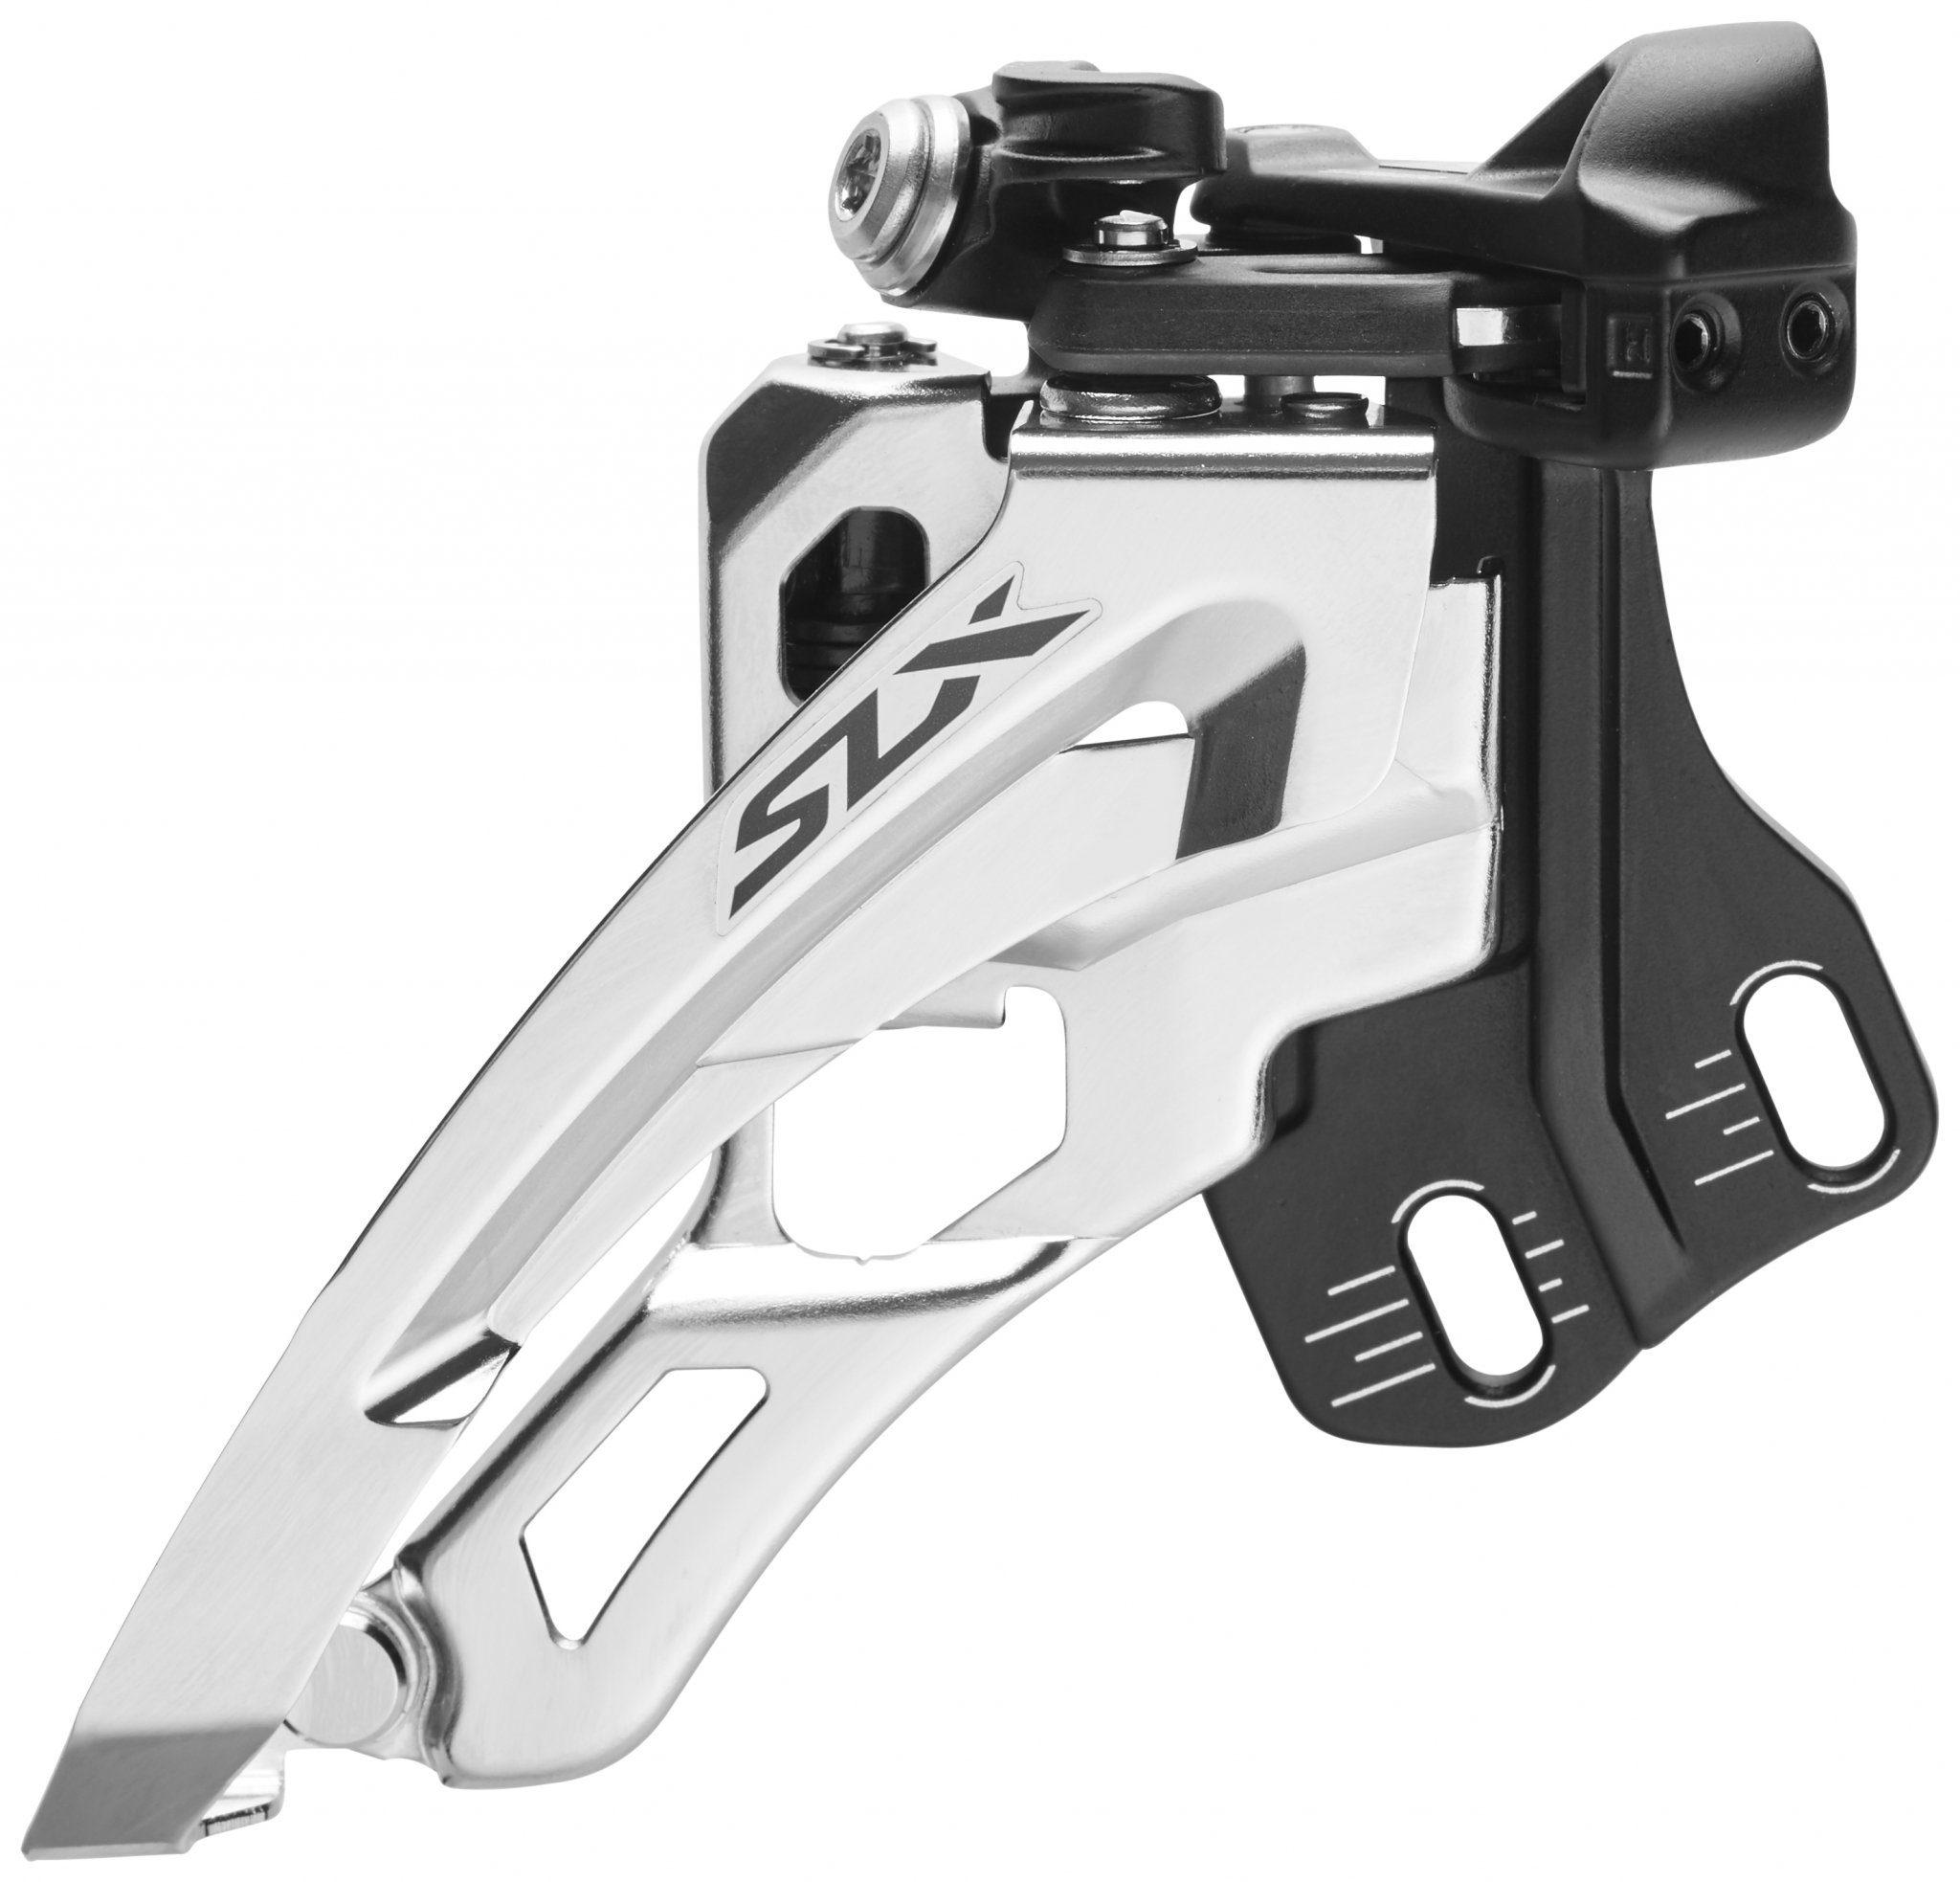 Shimano Schaltung »SLX FD-M7000 Umwerfer Direktmontage tief 3x10 Side«